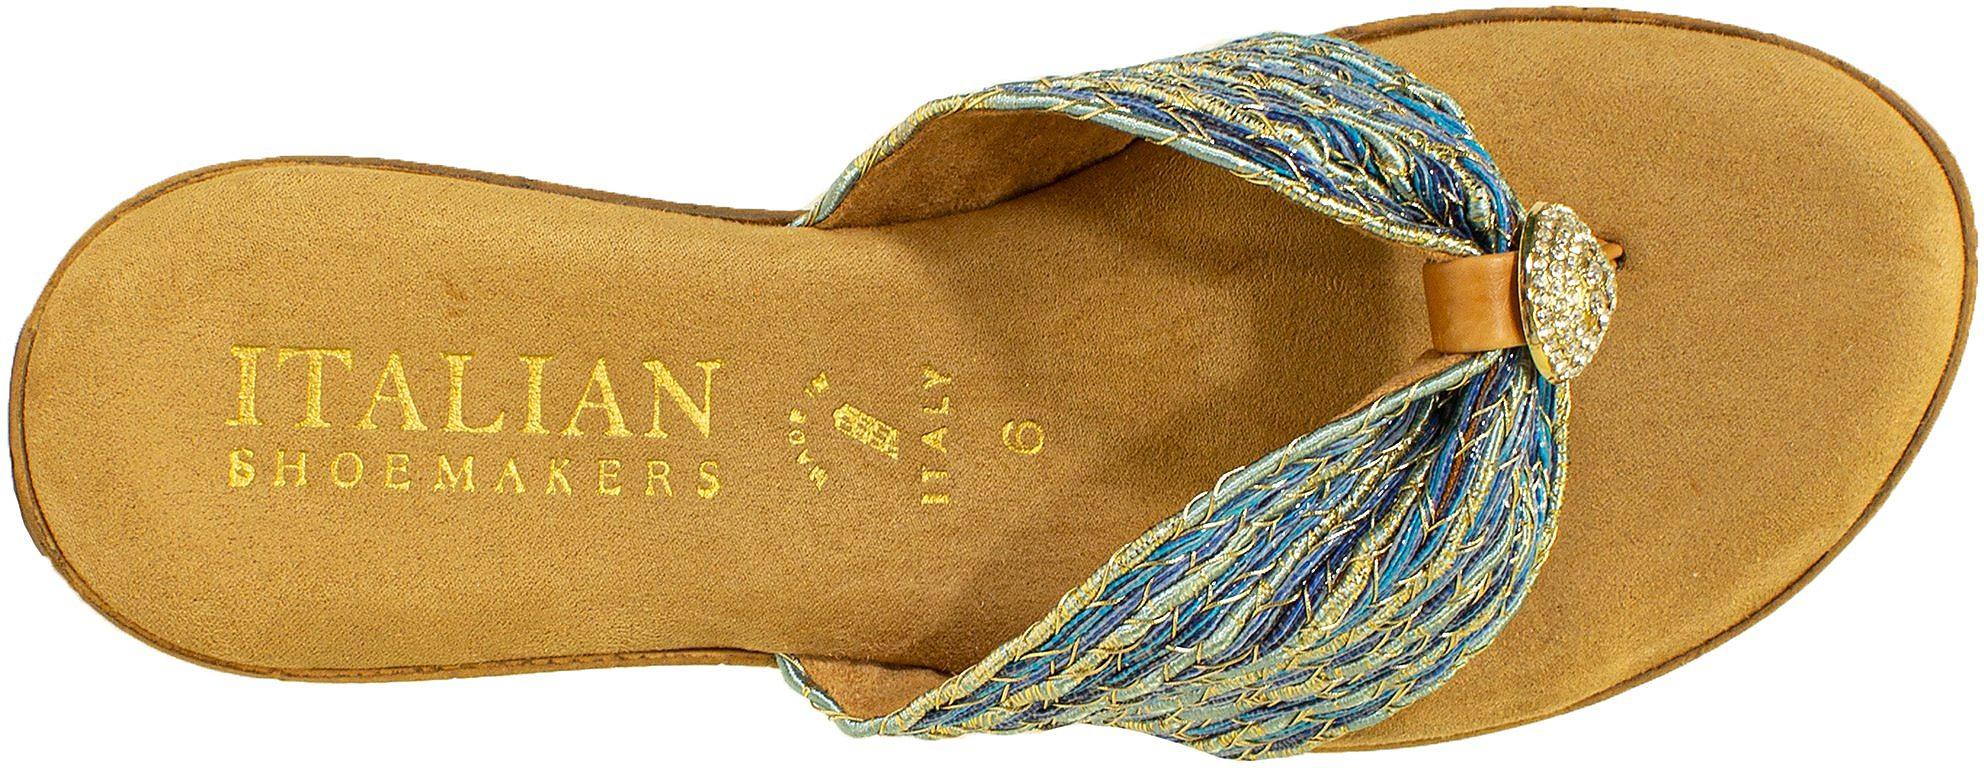 Italian Shoemakers Womens Cayman Wedge Sandals